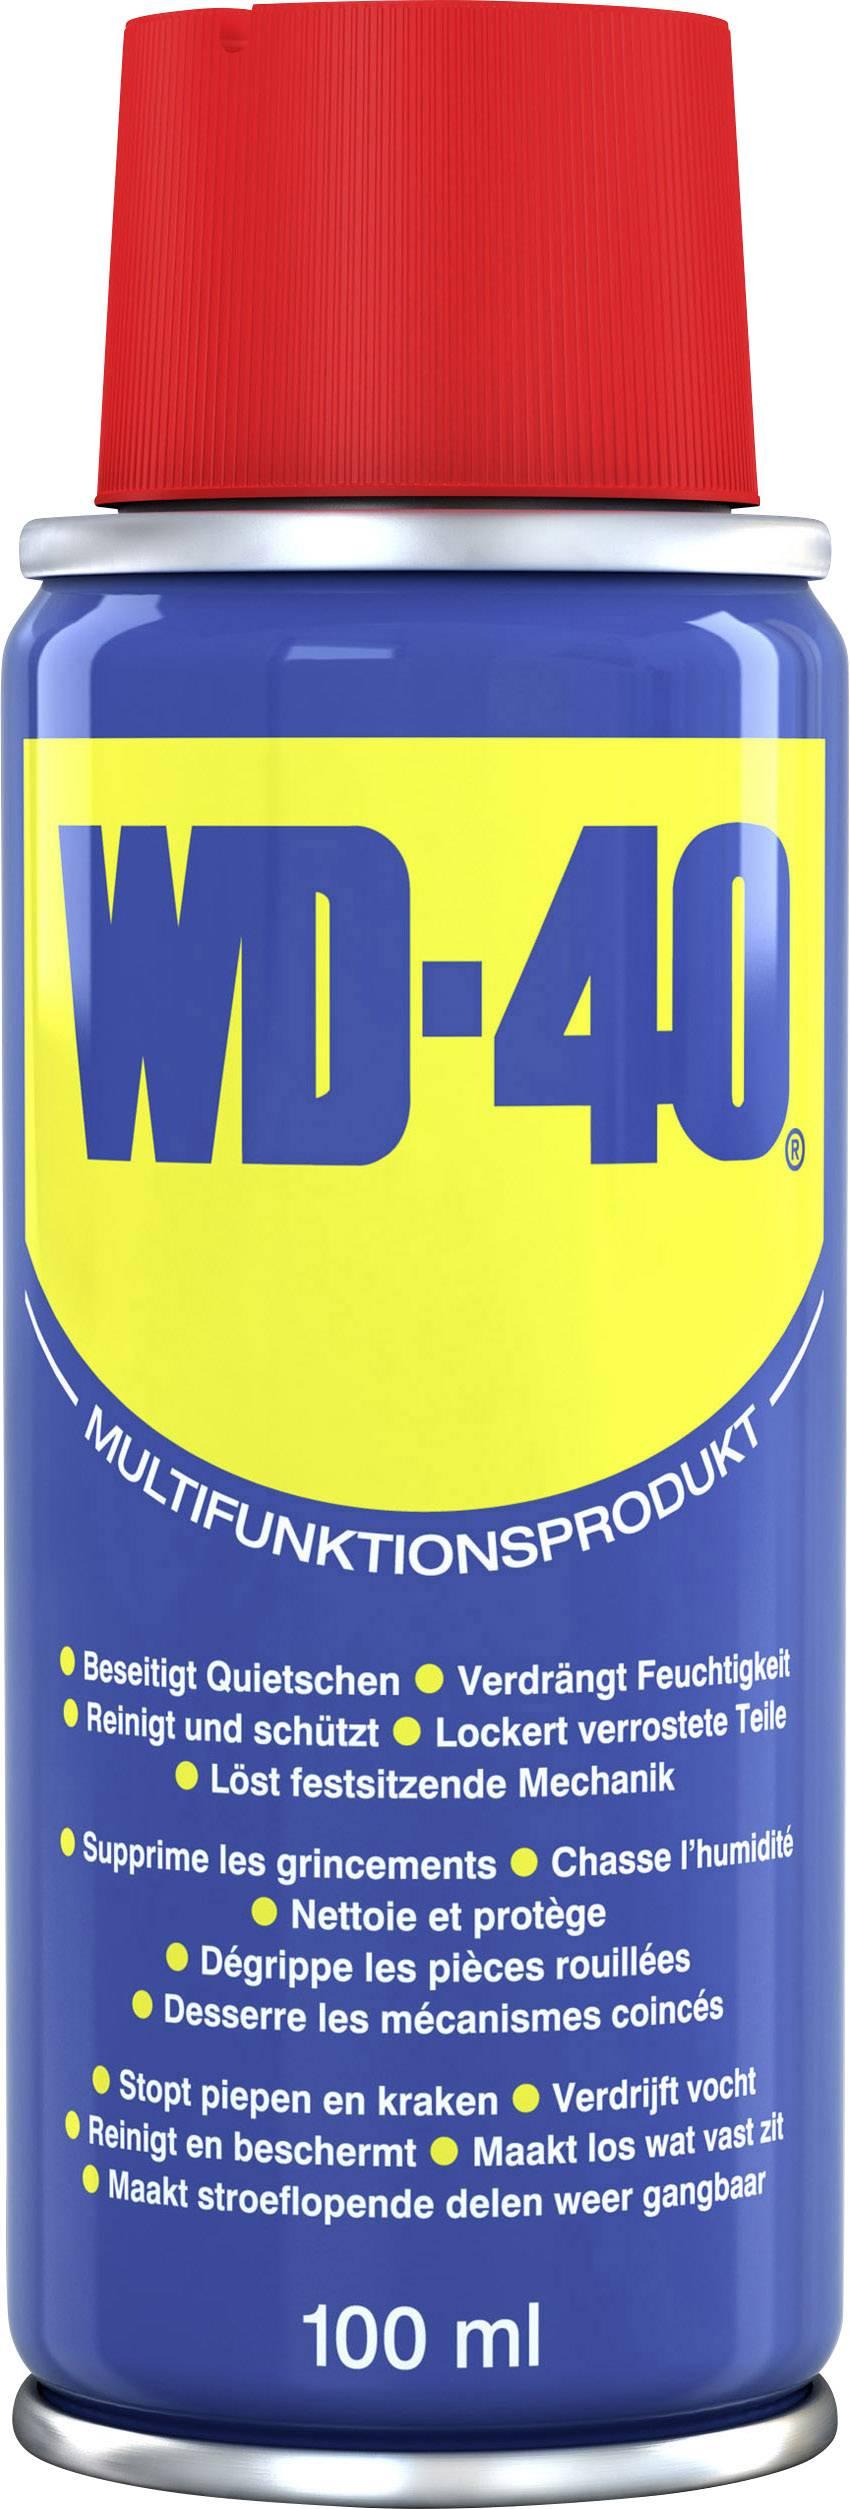 WD40 Company 49201, 100 ml